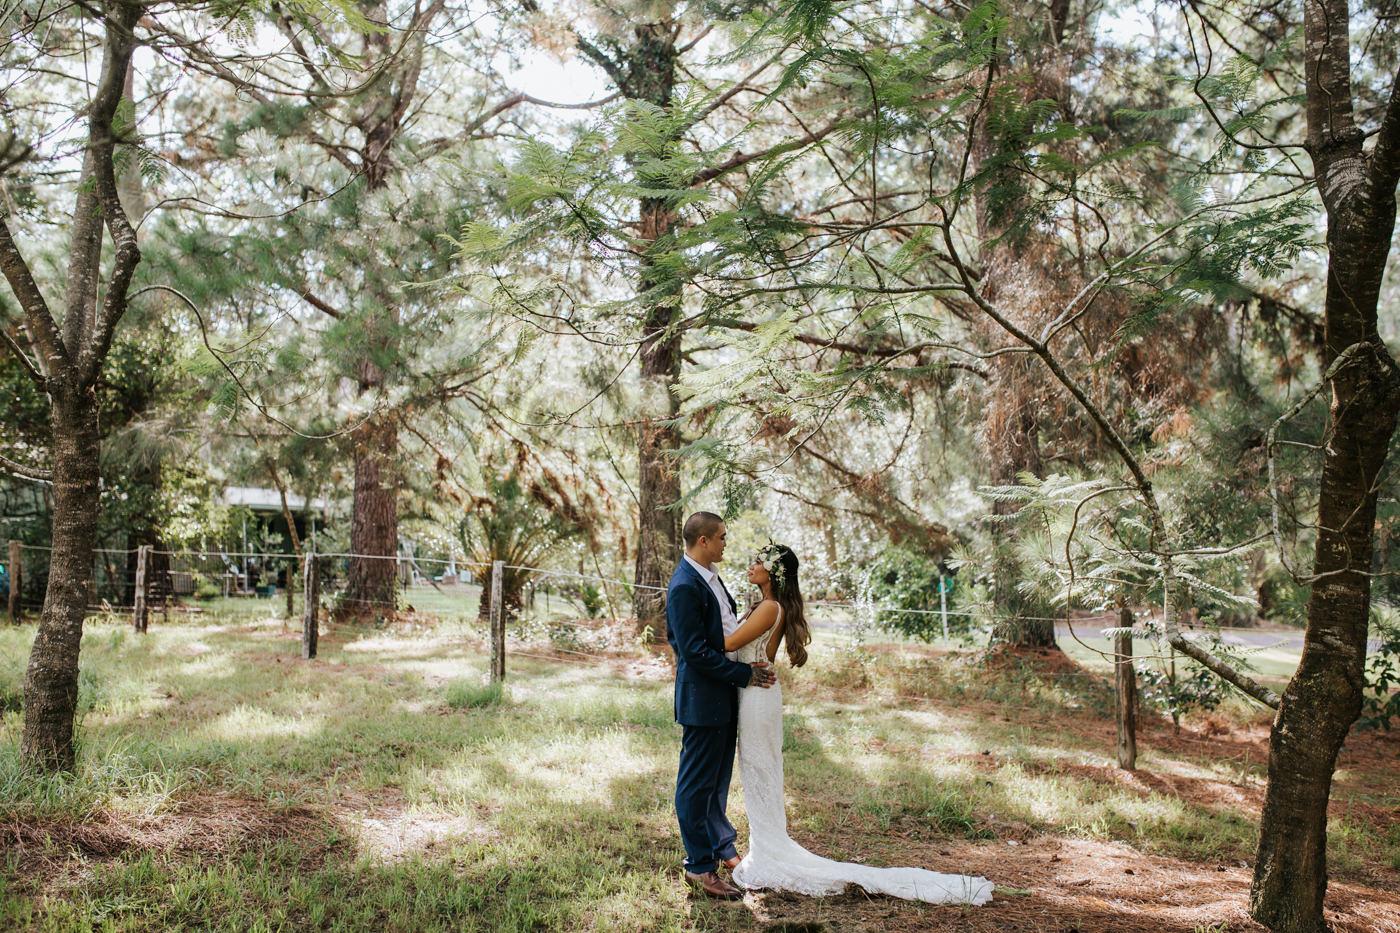 Nick & Vanezza - Fernbank Farm Wedding - Samantha Heather Photography-129.jpg